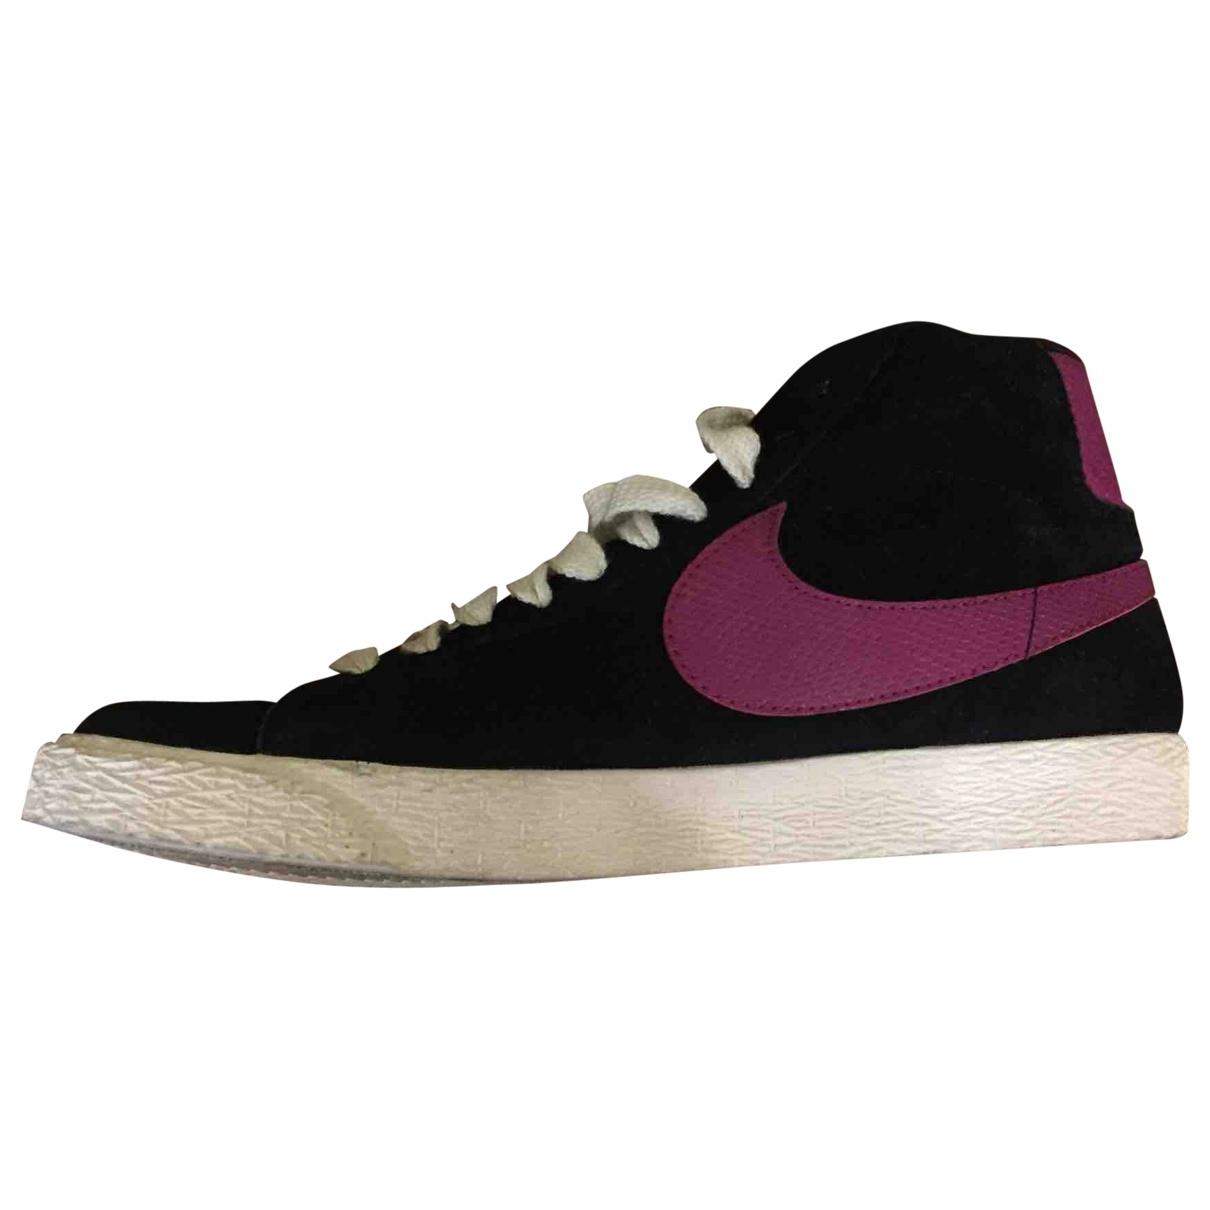 Nike - Baskets Blazer pour femme en suede - noir